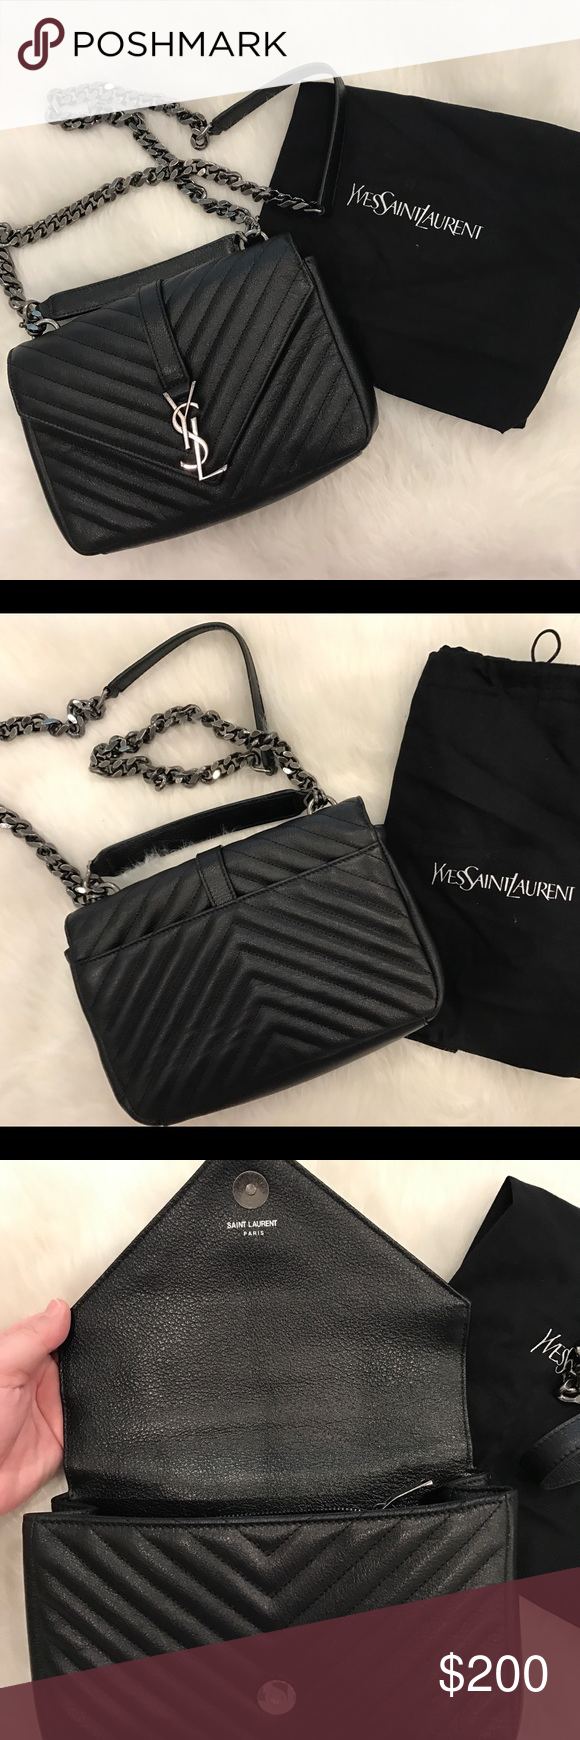 ac8c4f7bc11 YSL BLACK SMALL COLLEGE CHAIN CROSSBODY BAG Yvette Saint Laurent YSL black  small college crossbody bag